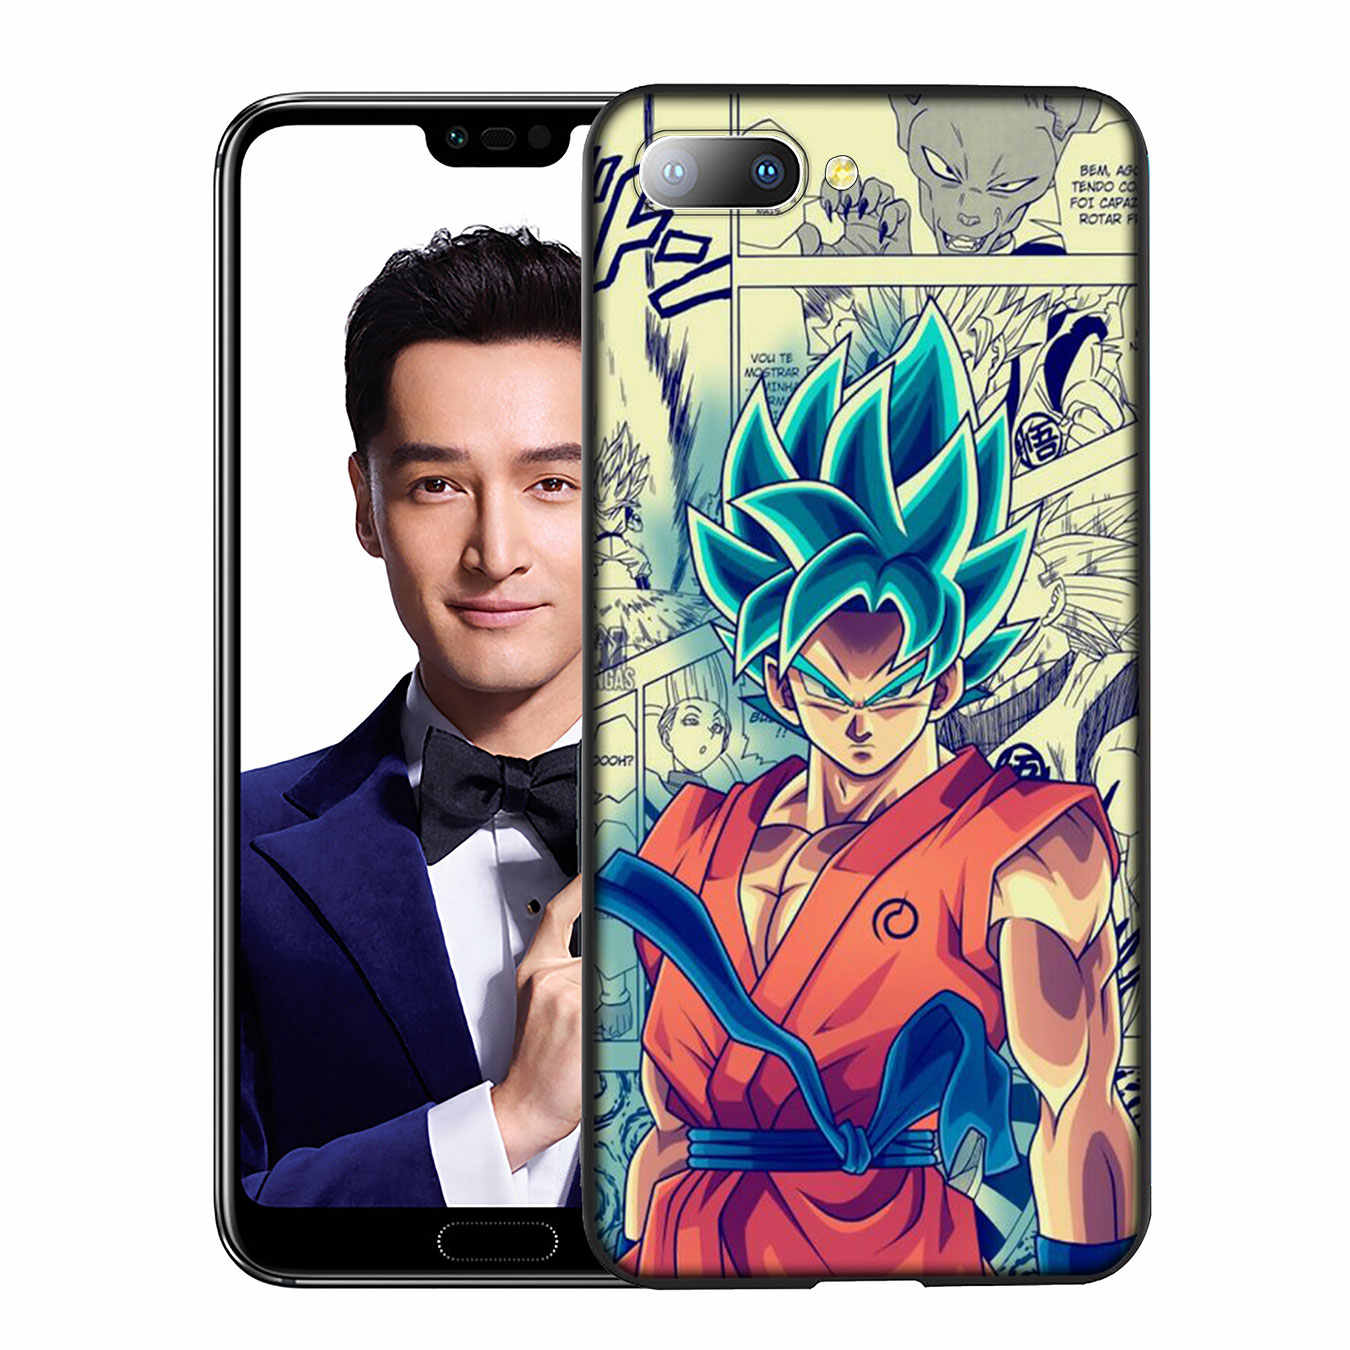 YIMAOC dragon topu Z DBZ Goku Yumuşak silikon kılıf için Huawei Y9 Y7 Y6 Başbakan 2019 Onur 20 8C 8X8 9 9X10 Lite 7C 7X 7A Pro Kapak